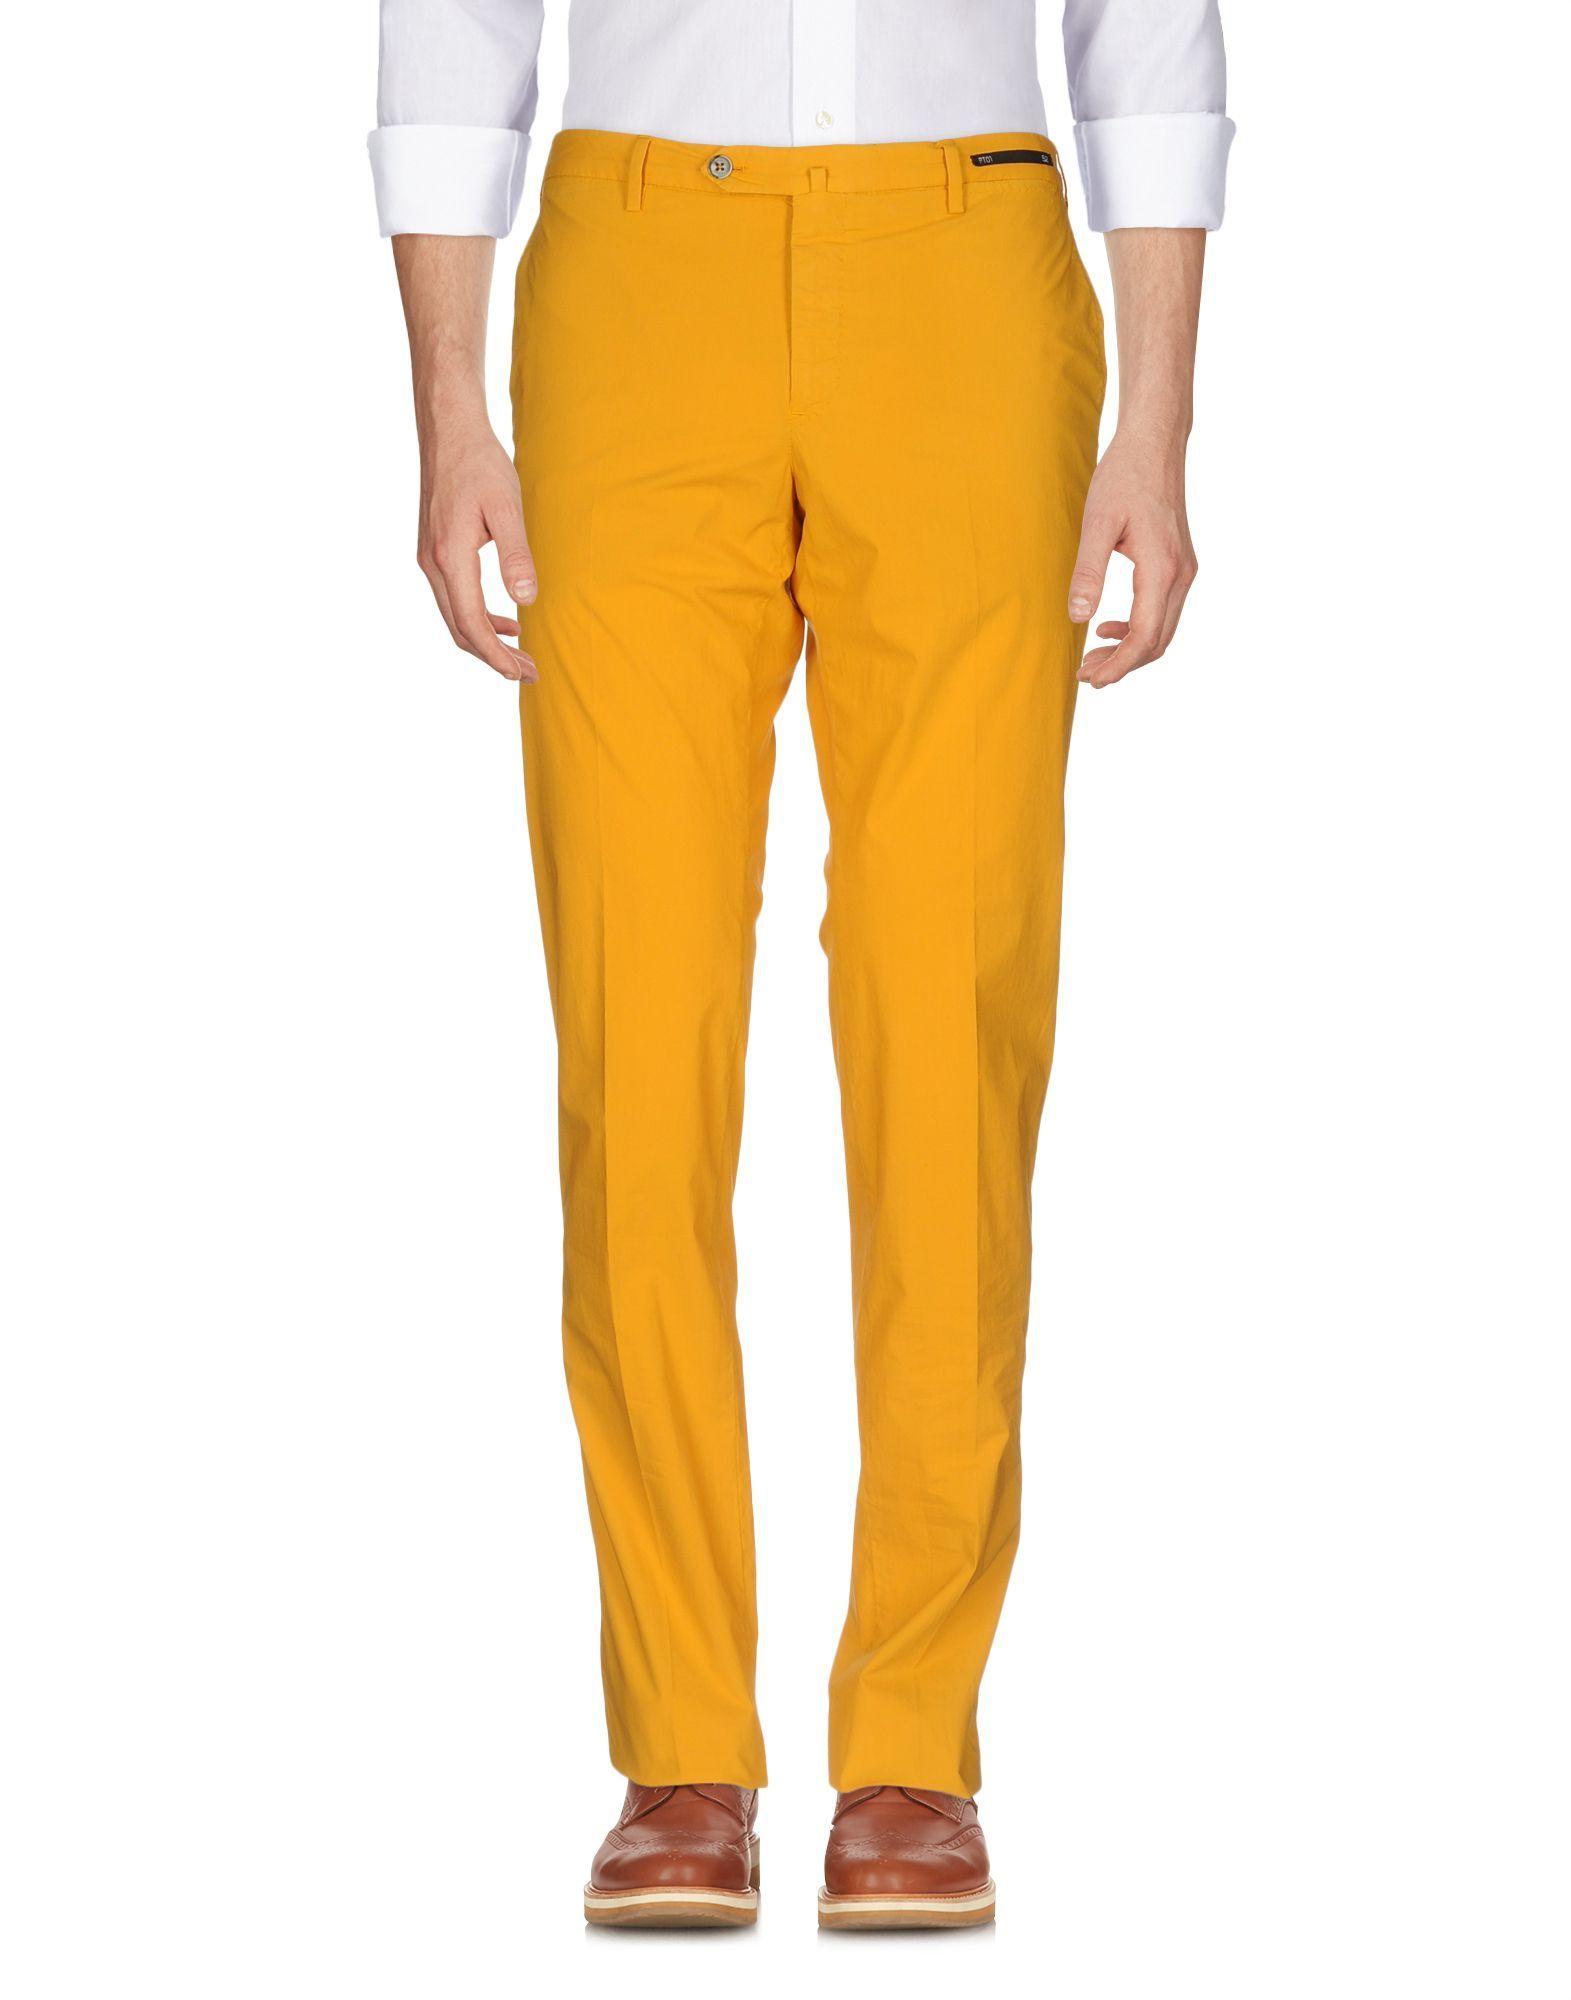 For Sale Sale Online Footlocker Cheap Online casual chinos - Yellow & Orange PT01 Explore Cheap Price Buy Cheap Great Deals BQsn3UR